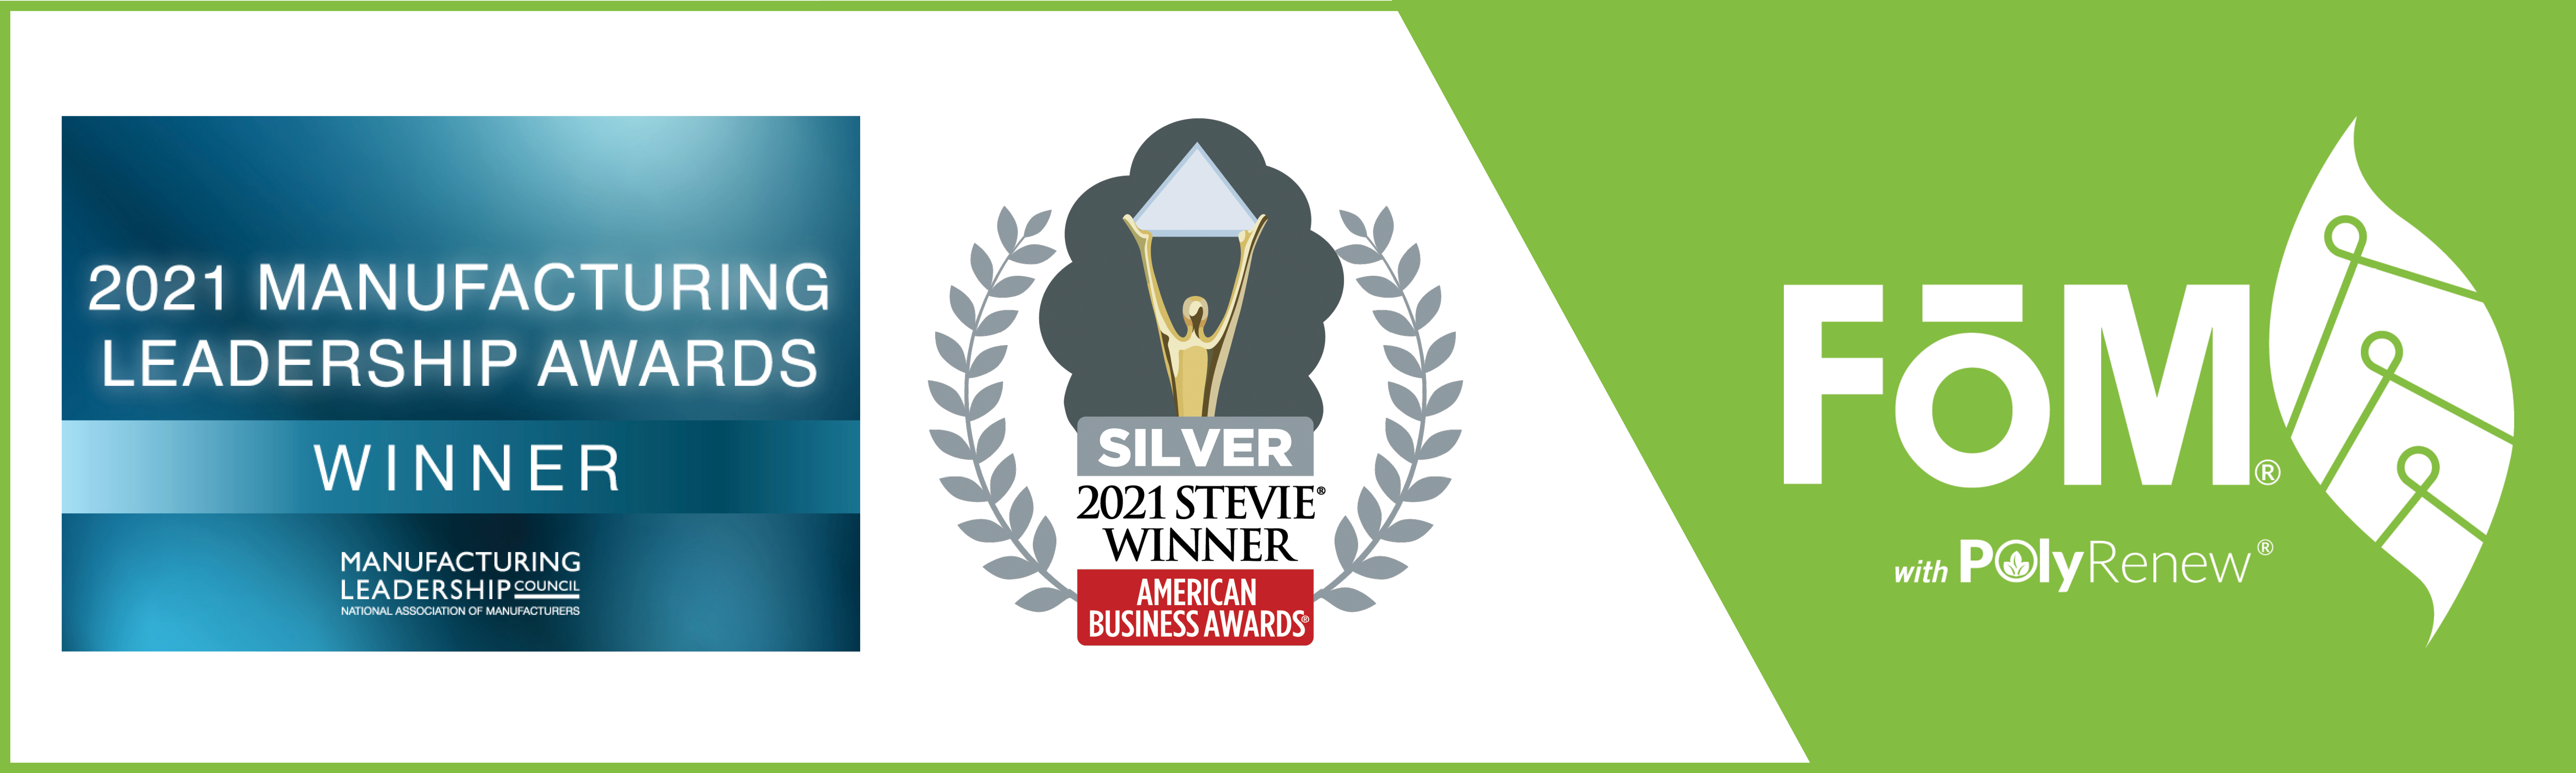 National Association of Manufacturers and Stevie Award logos with FōM logo